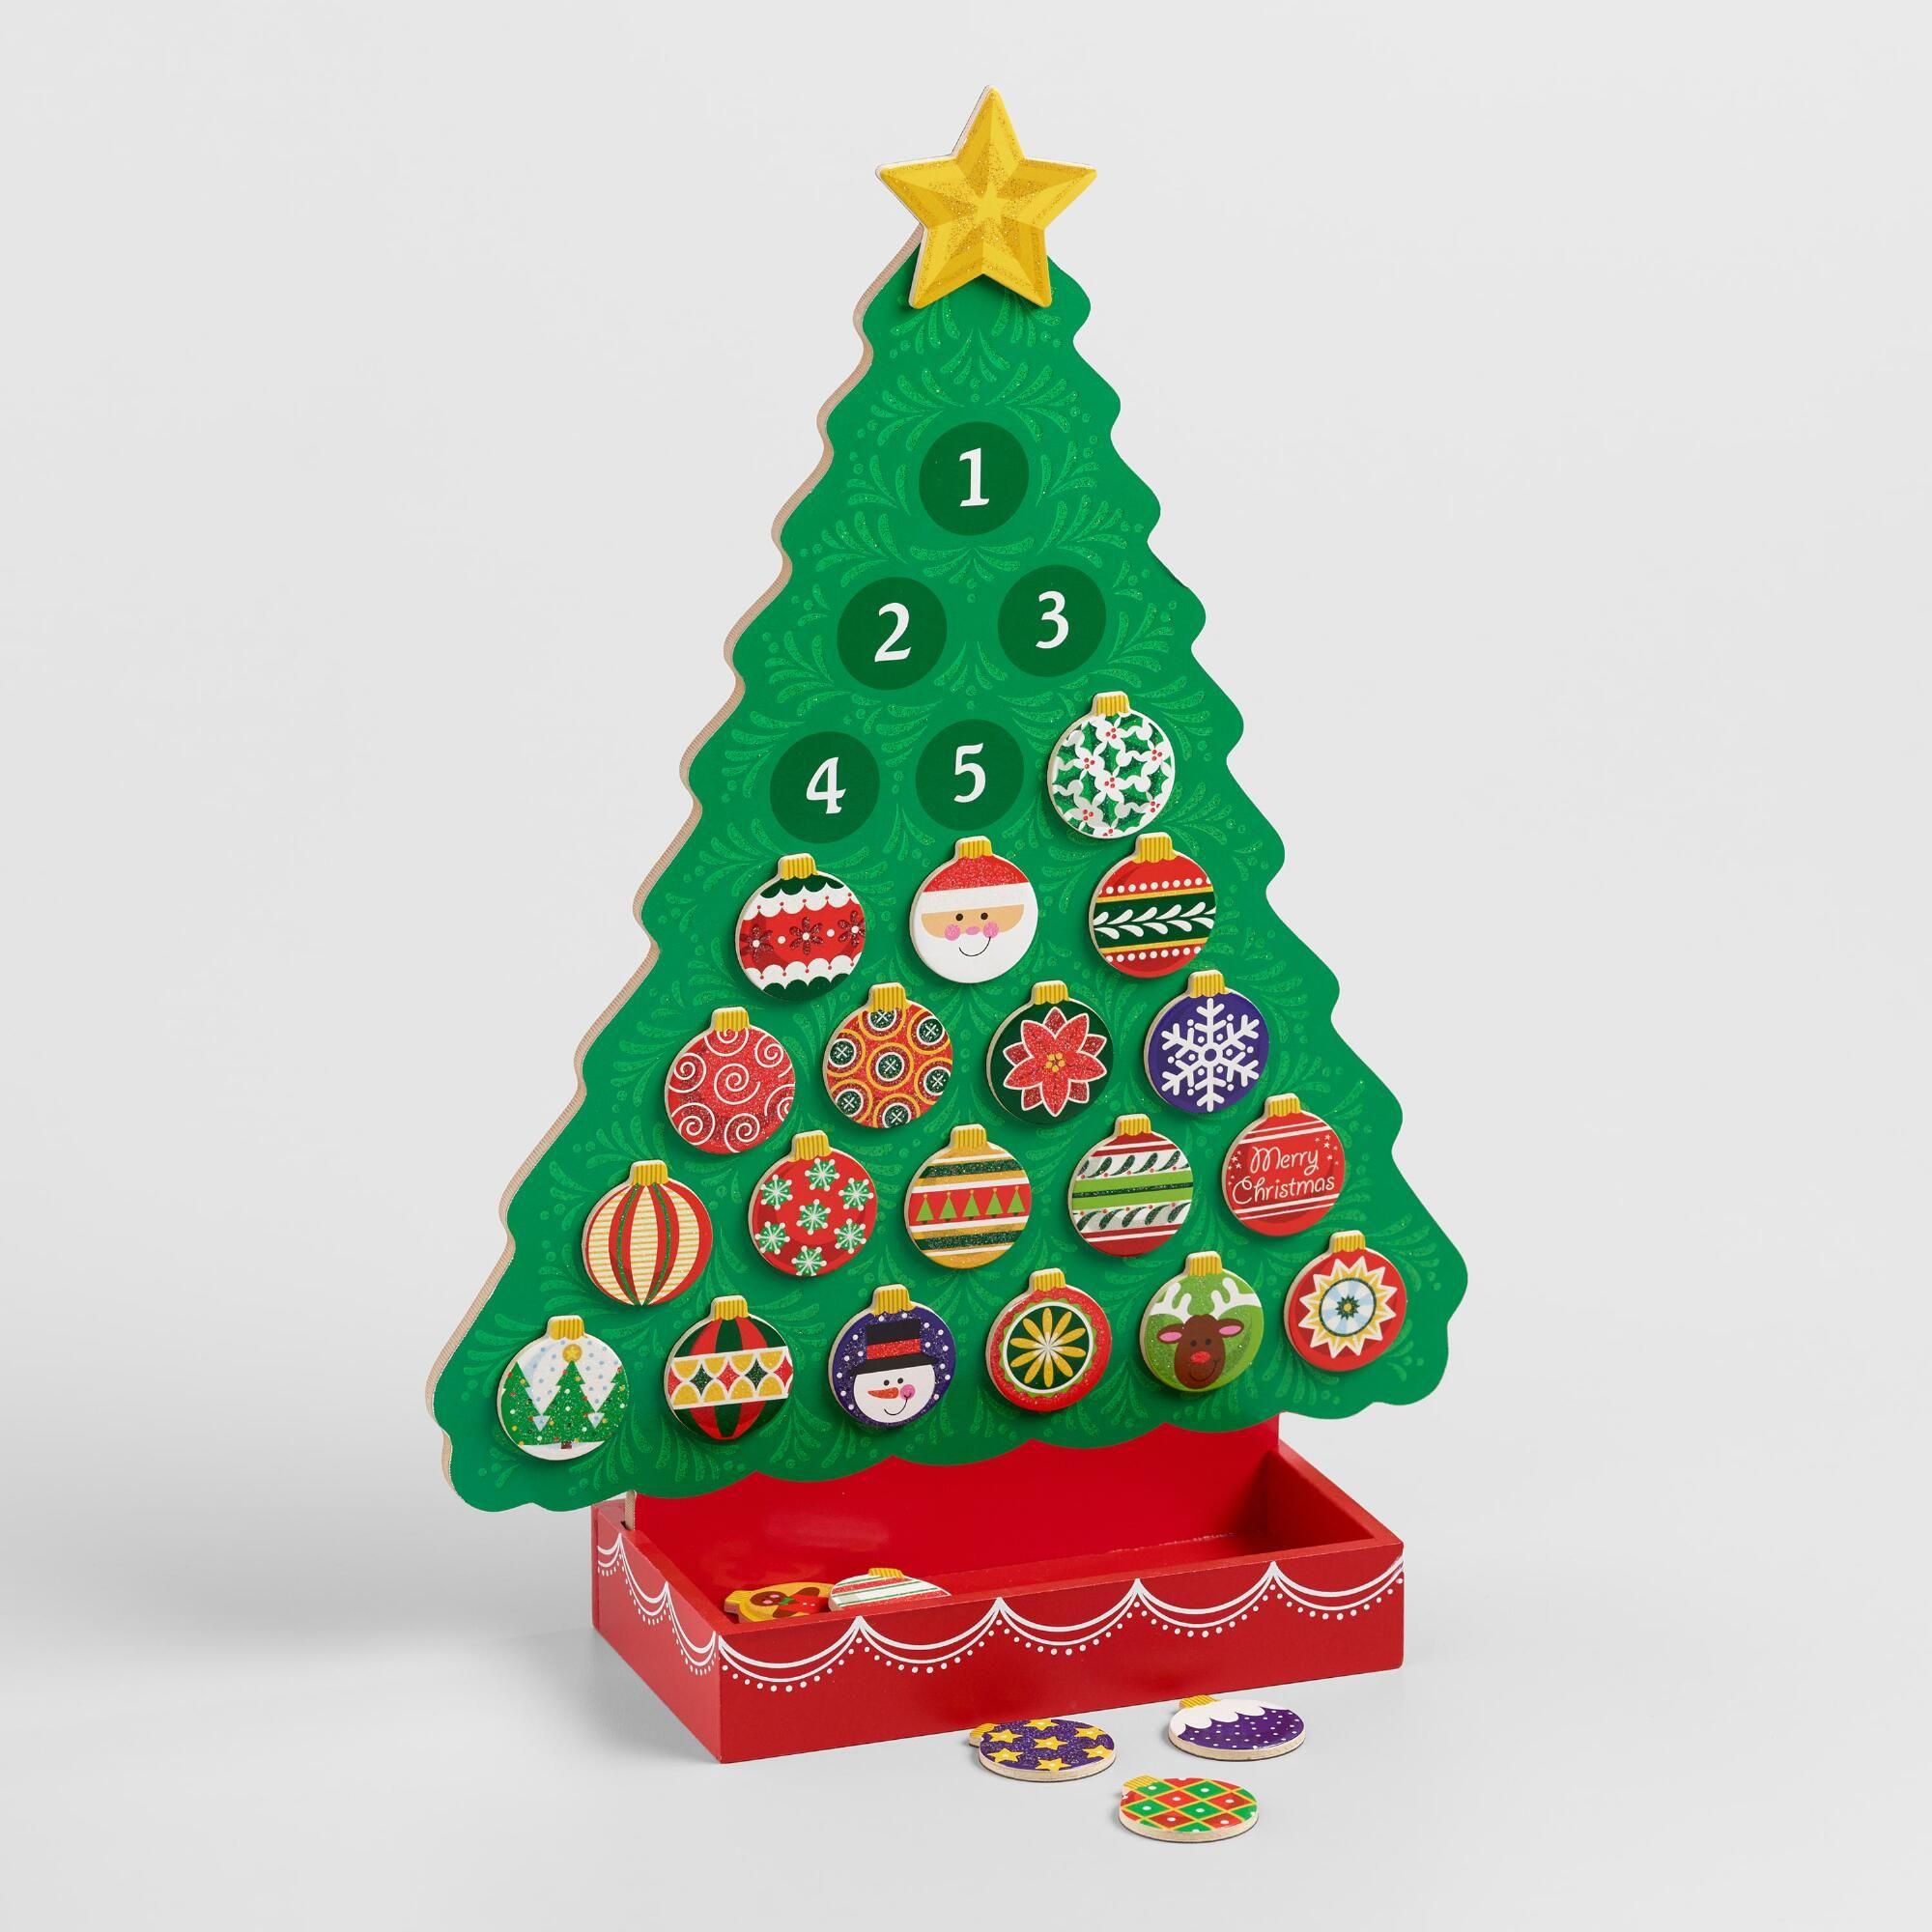 Melissa And Doug Magnetic Christmas Tree Advent Calendar